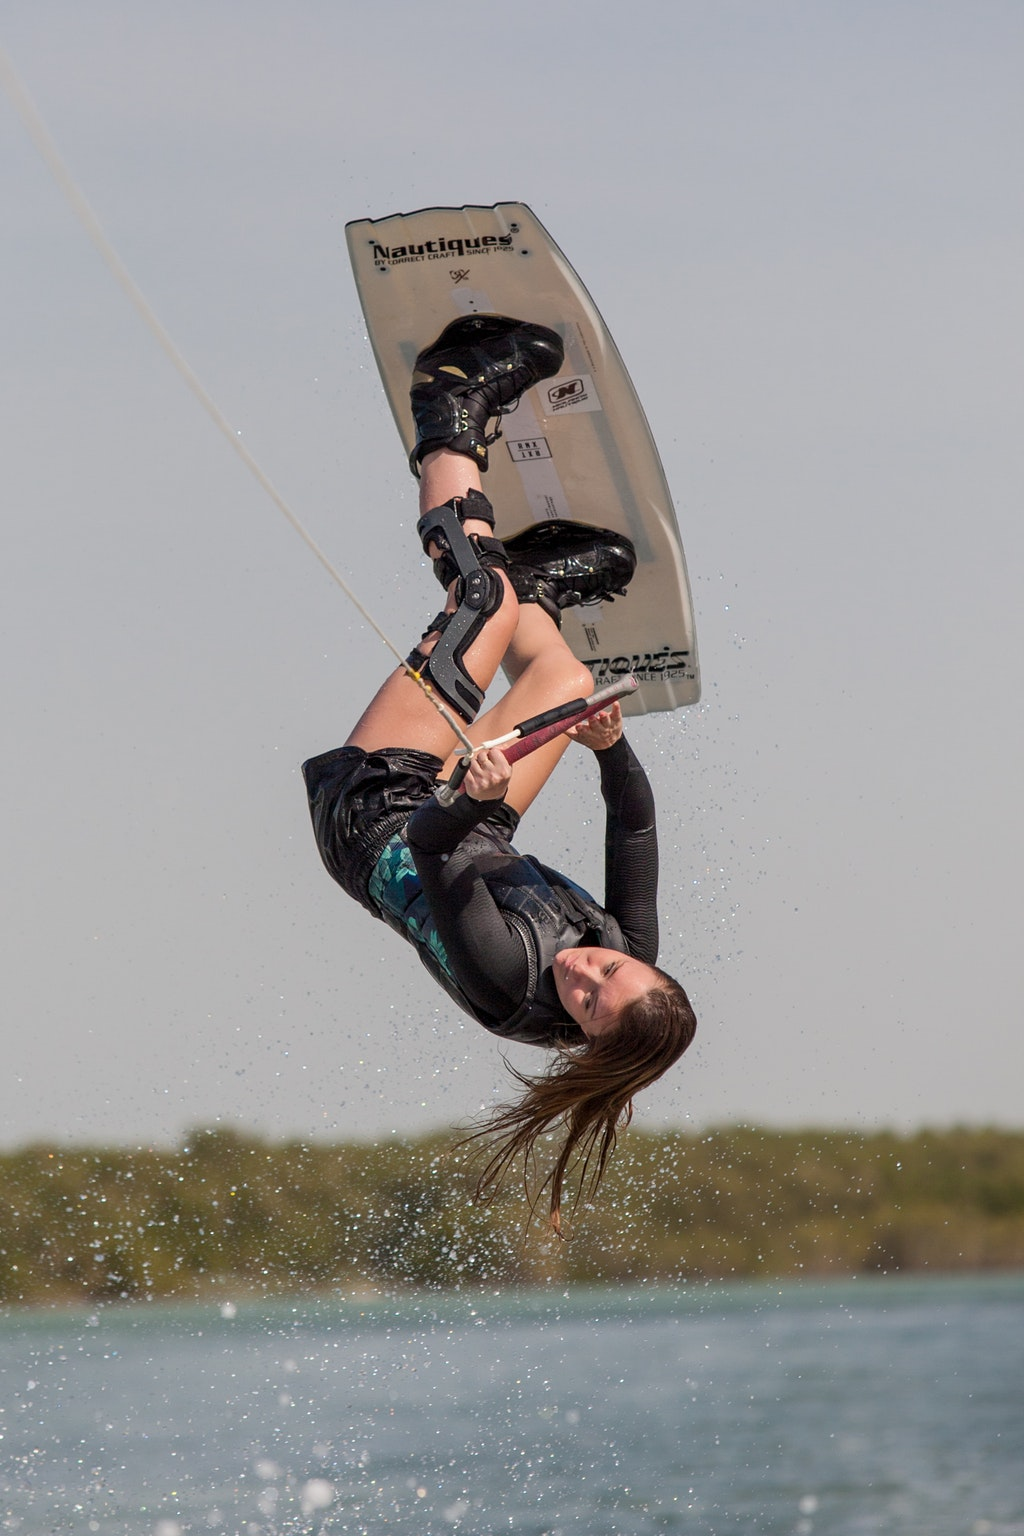 Charlotte Millward, TeamGB 🇬🇧, at the 2019 Worlds Abu Dhabi